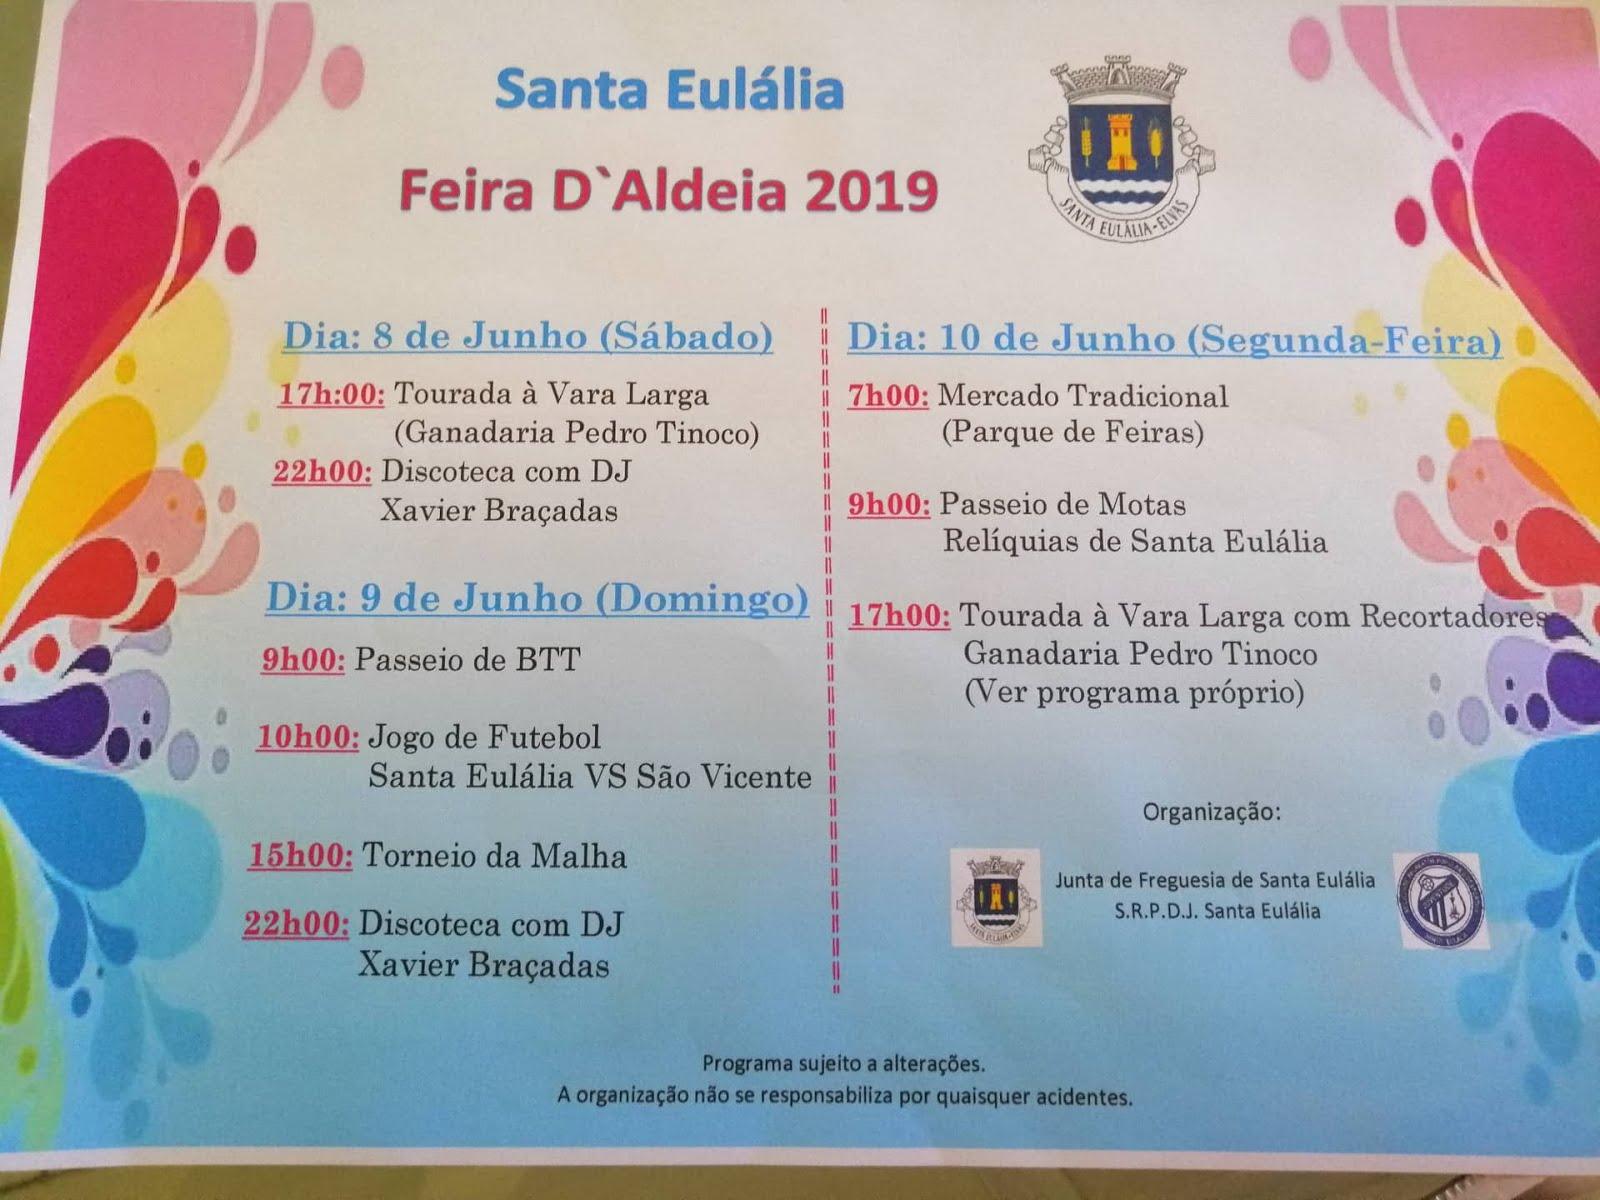 FEIRA D'ALDEIA 2019 - SANTA EULÁLIA - 08 A 10 DE JUNHO DE 2019.